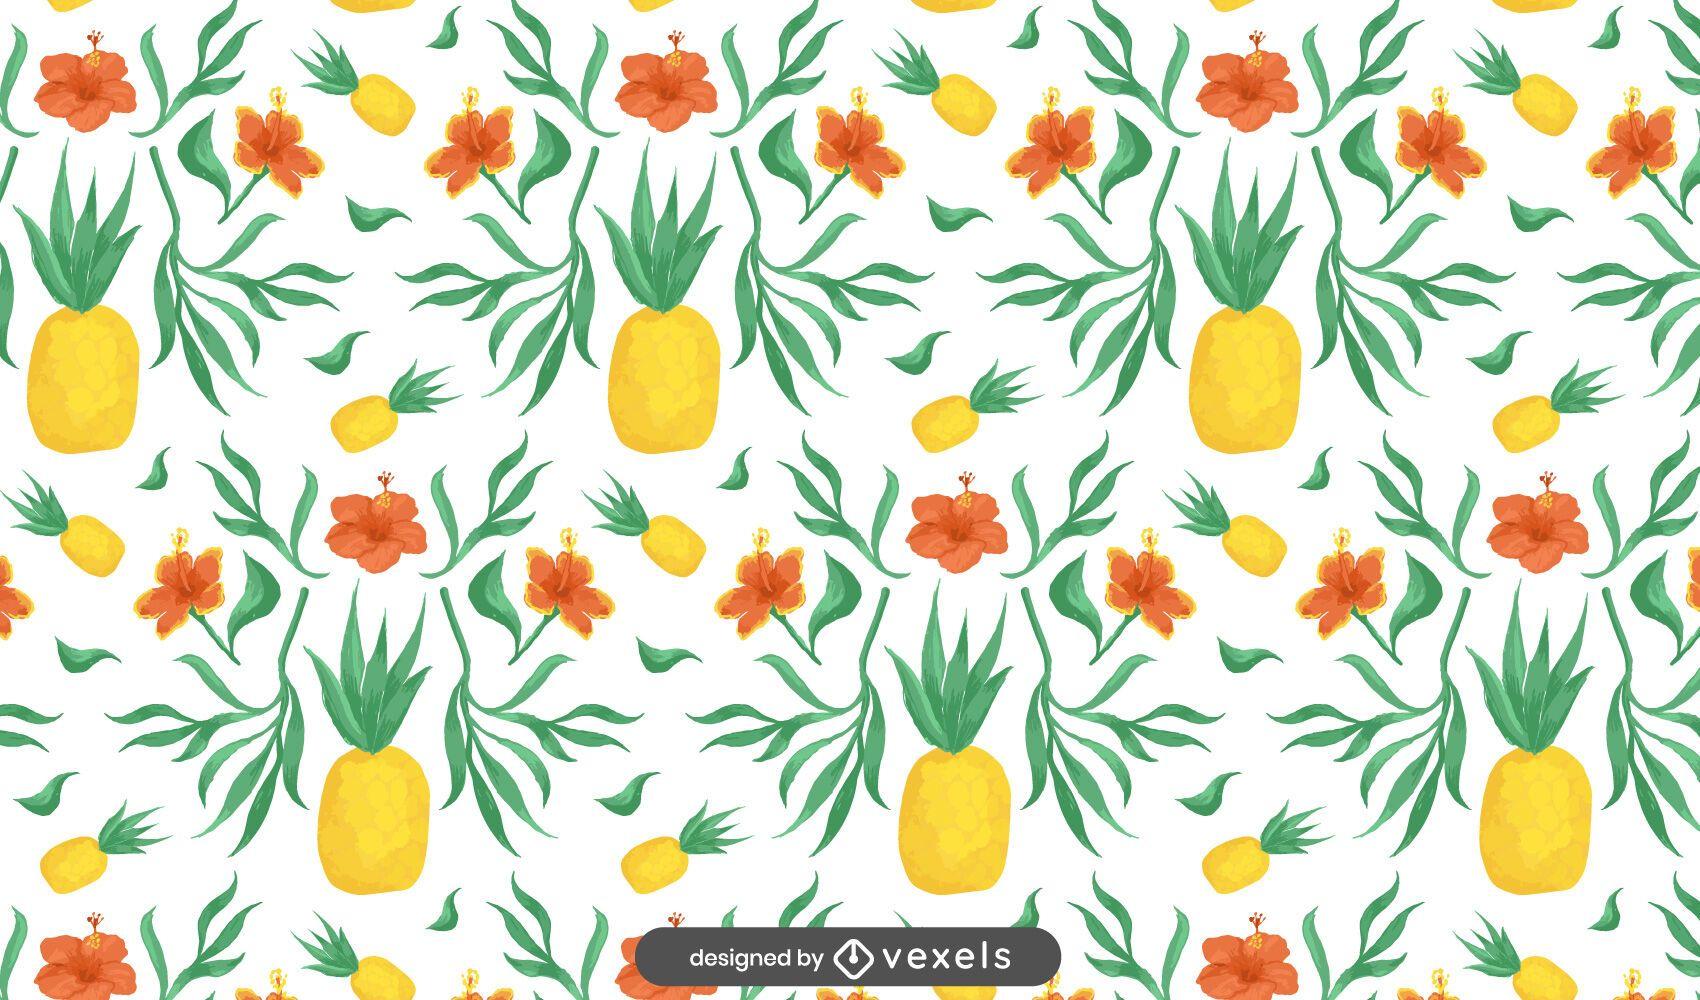 Floral pineapples pattern design